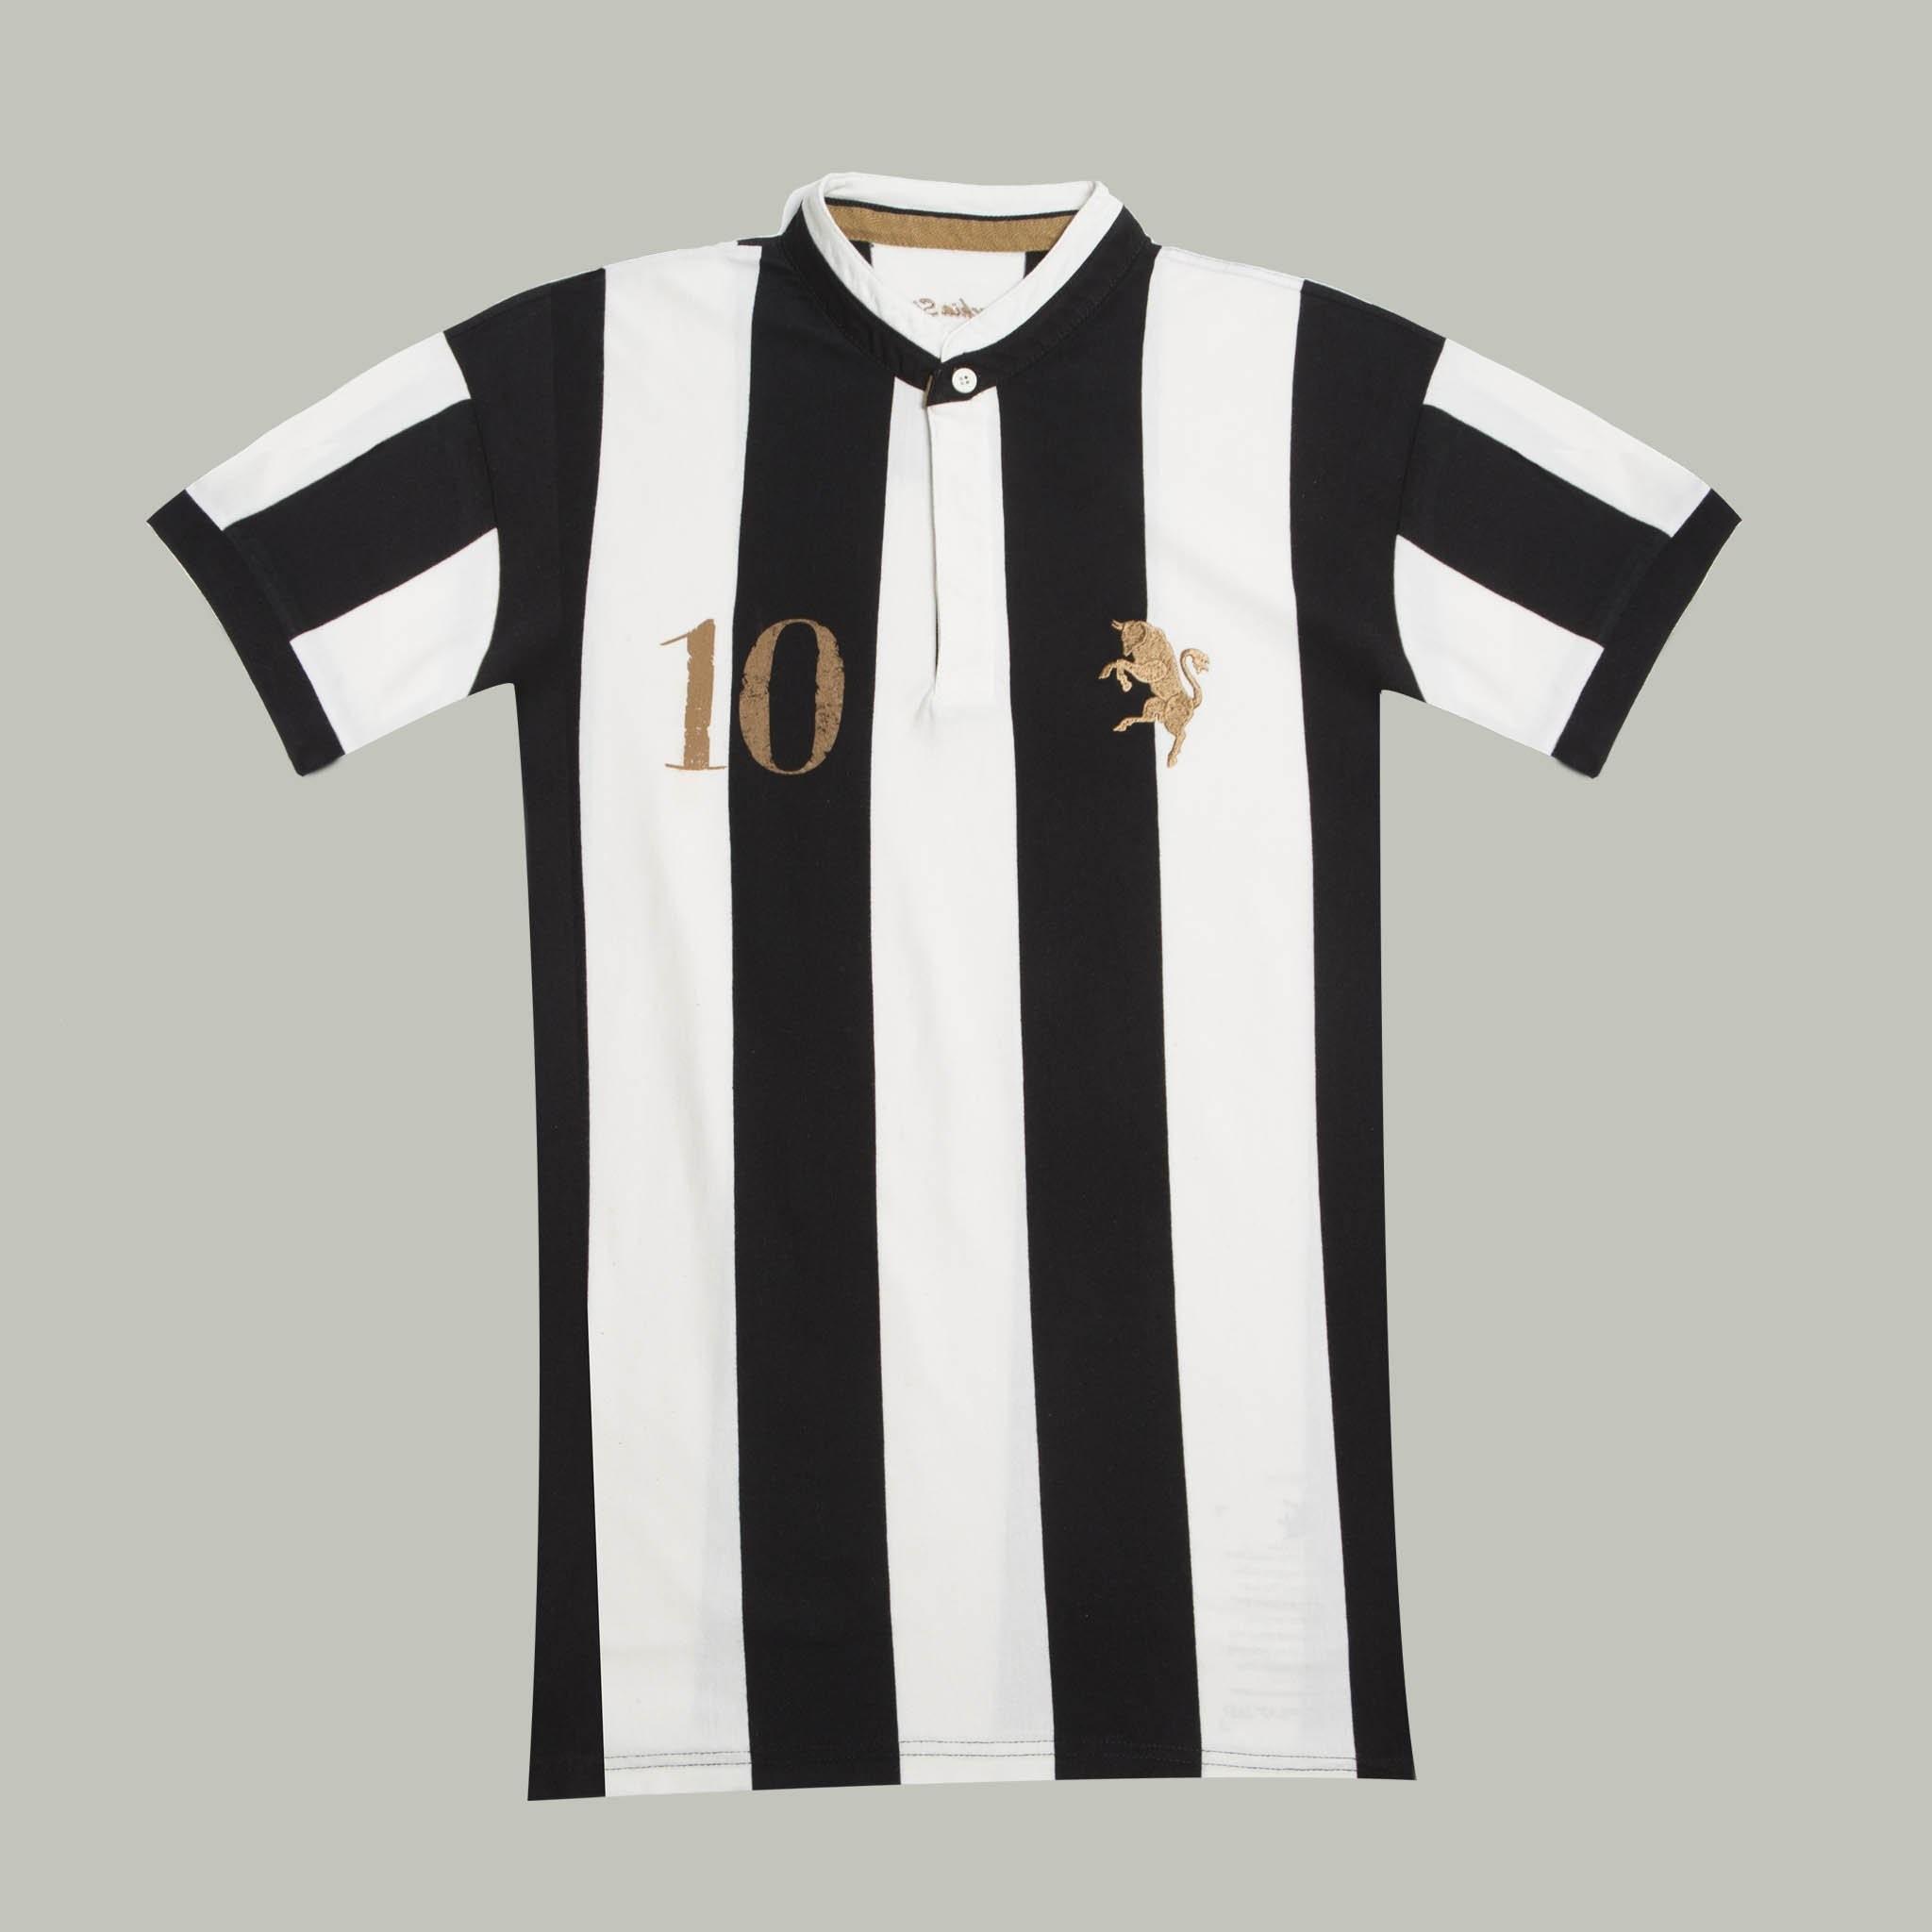 Camiseta retro de Fútbol COOLLIGAN LA VECCHIA SIGNORA 1897 manga corta 6ef54a0a8081f